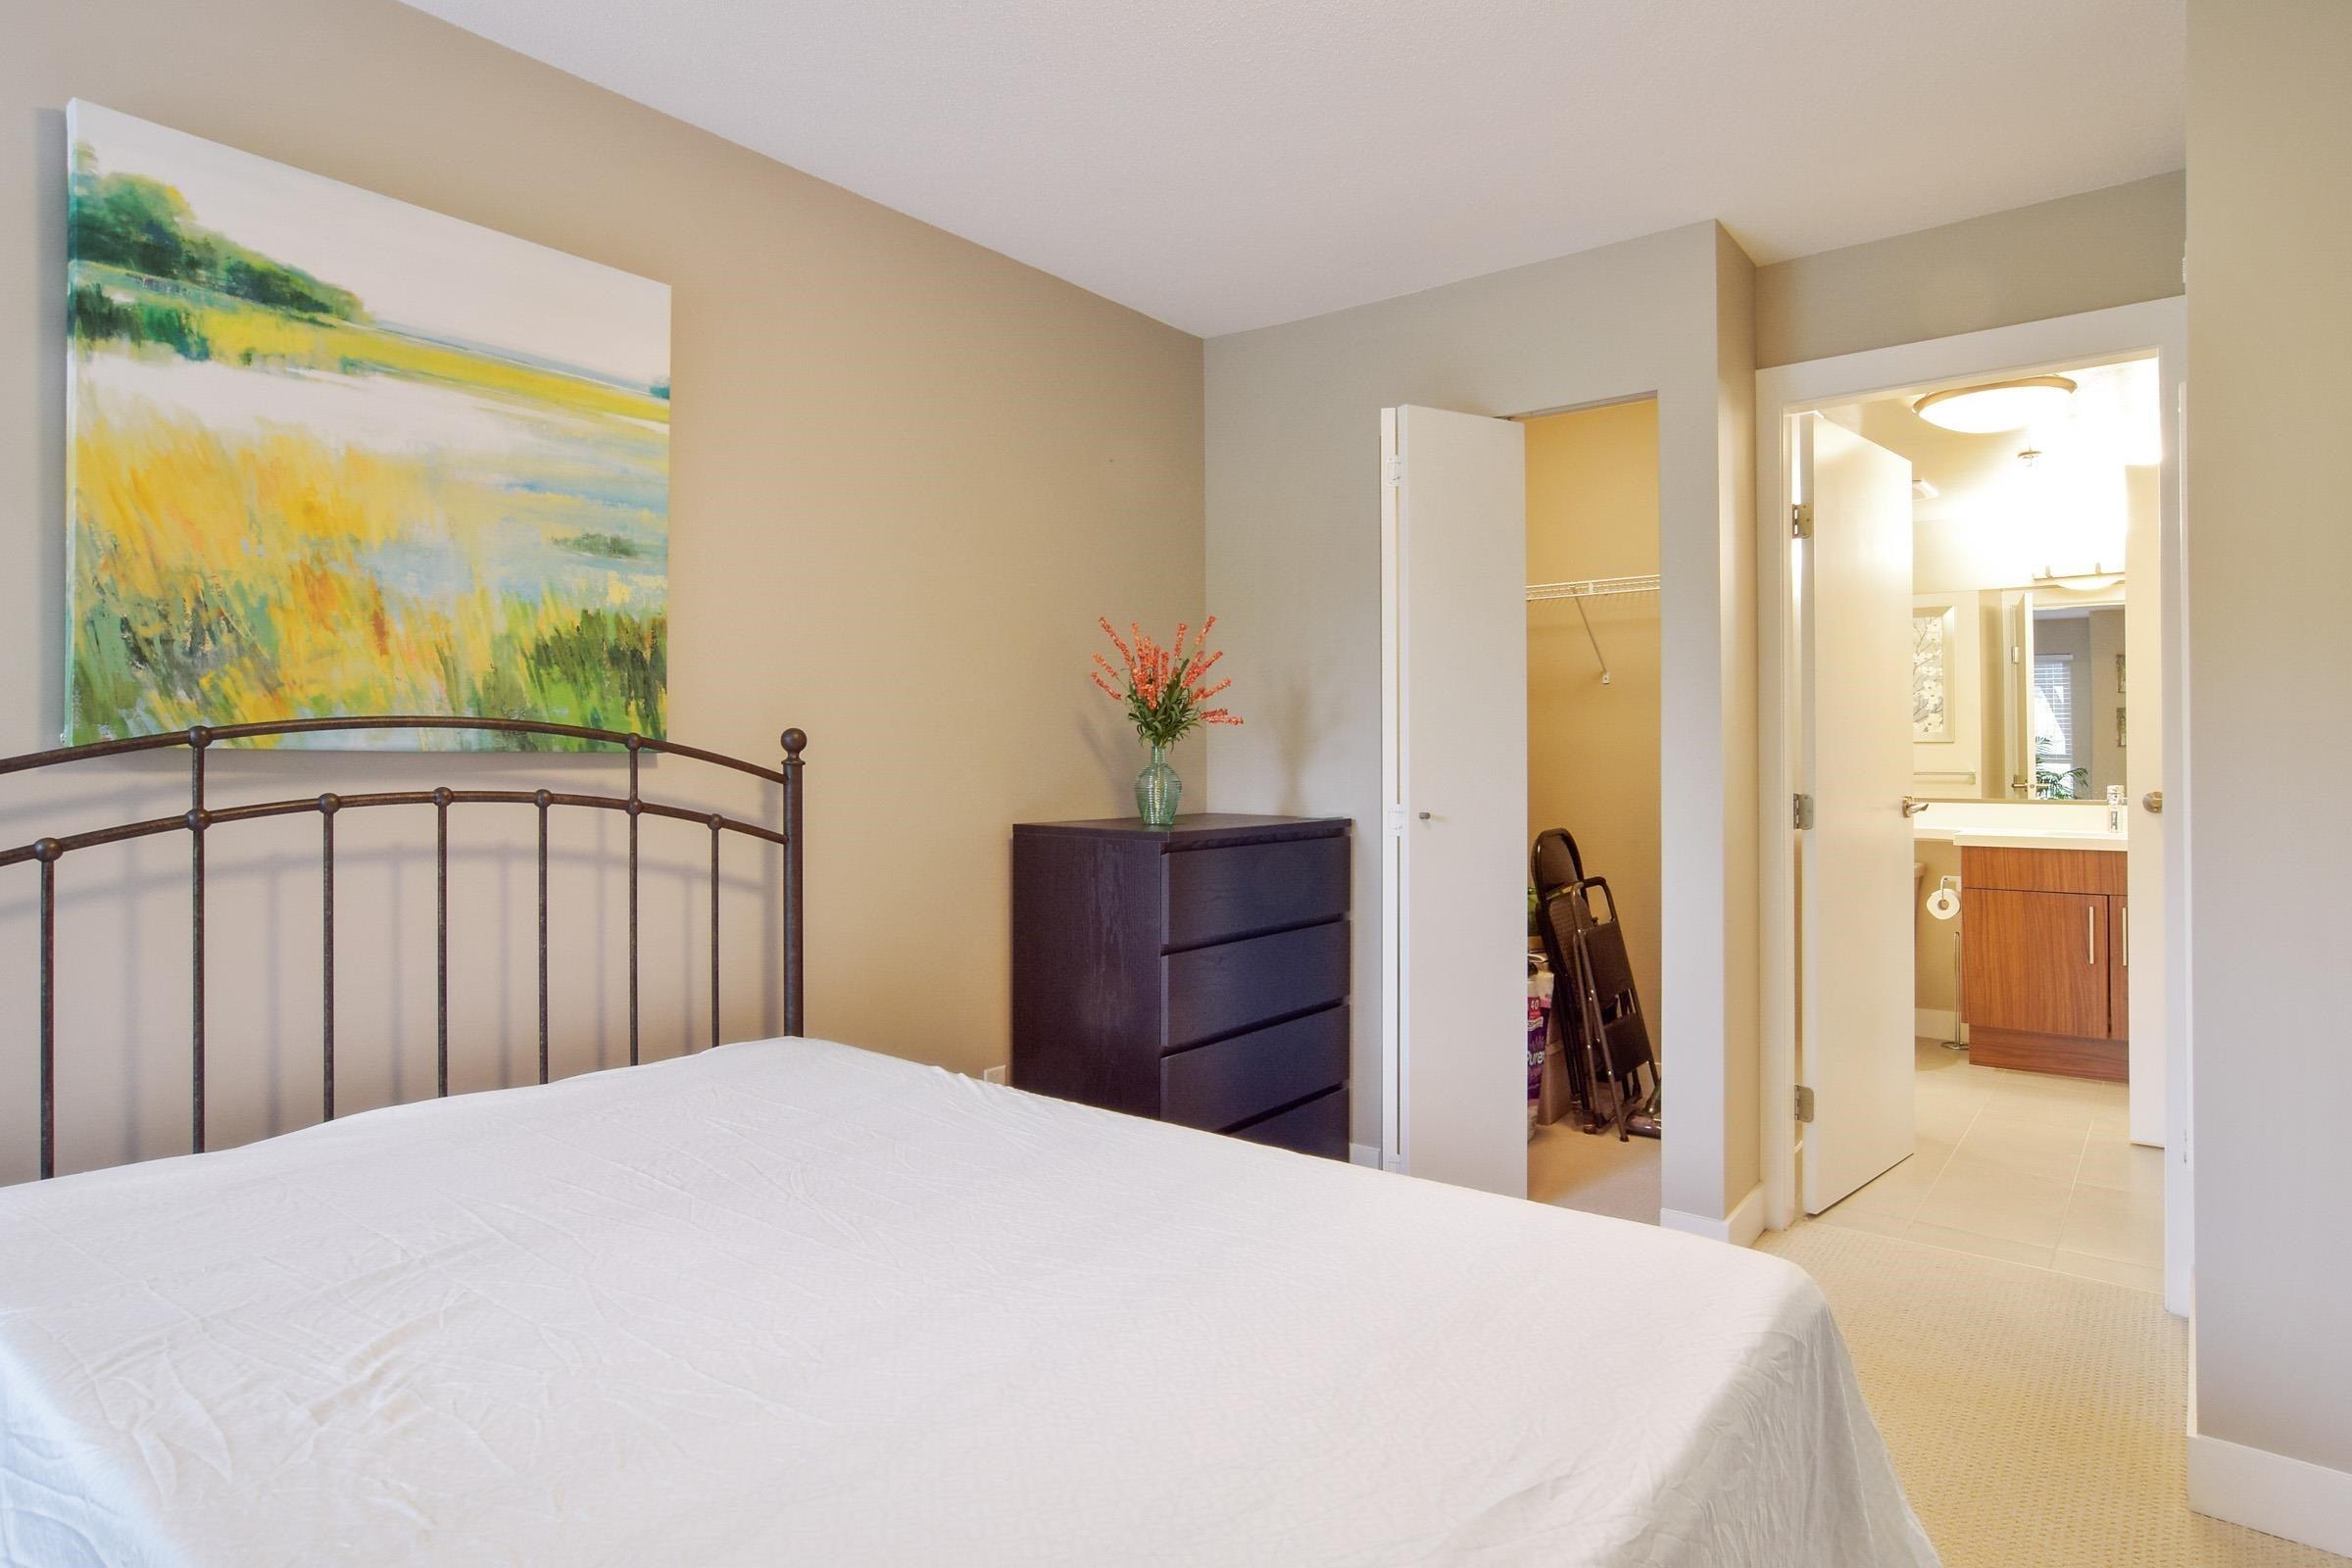 301 7131 STRIDE AVENUE - Edmonds BE Apartment/Condo for sale, 1 Bedroom (R2625669) - #12